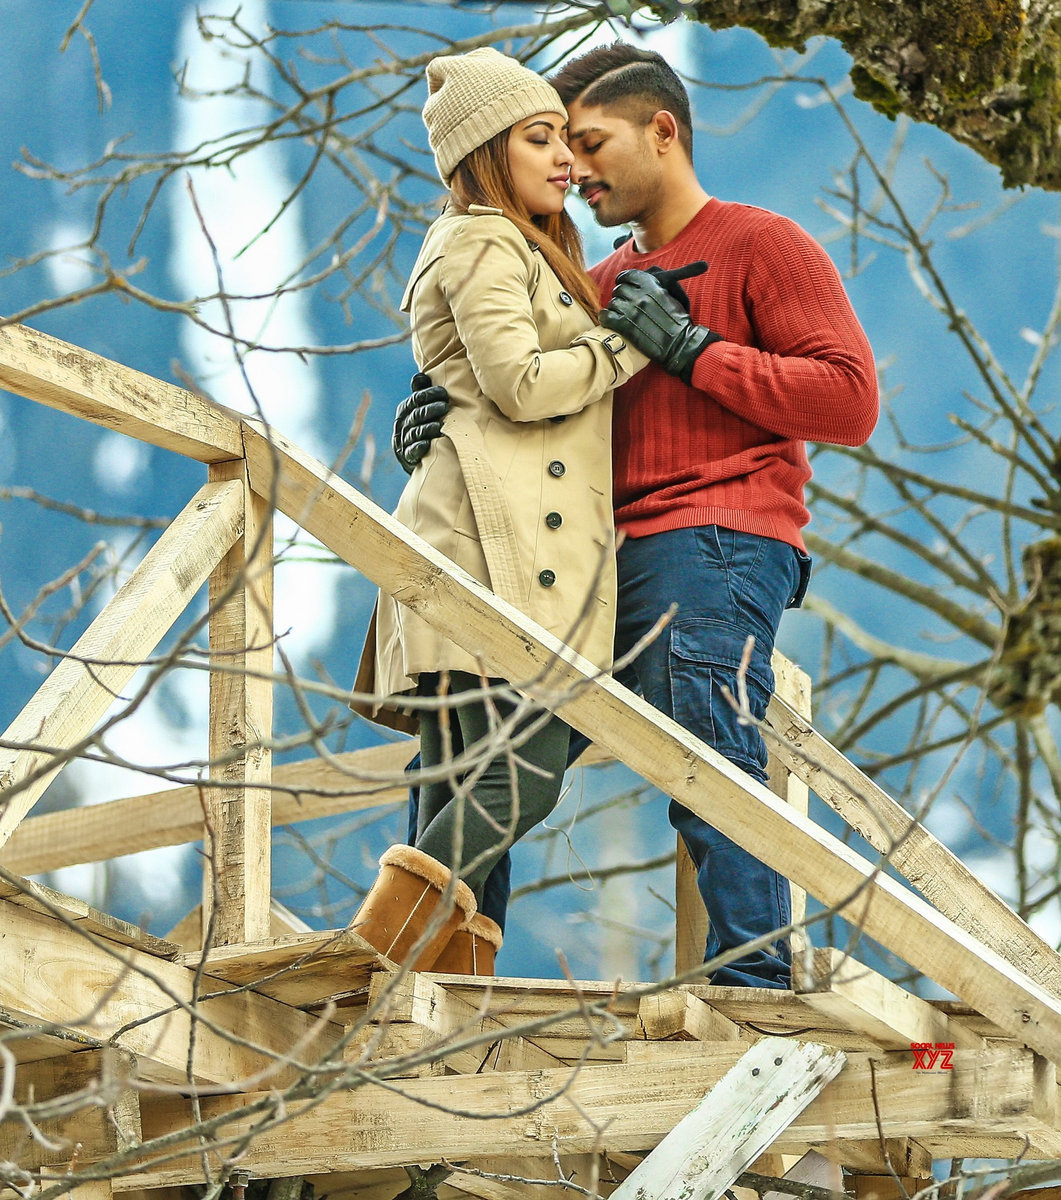 tamilrockers 2015 movies in hindi download